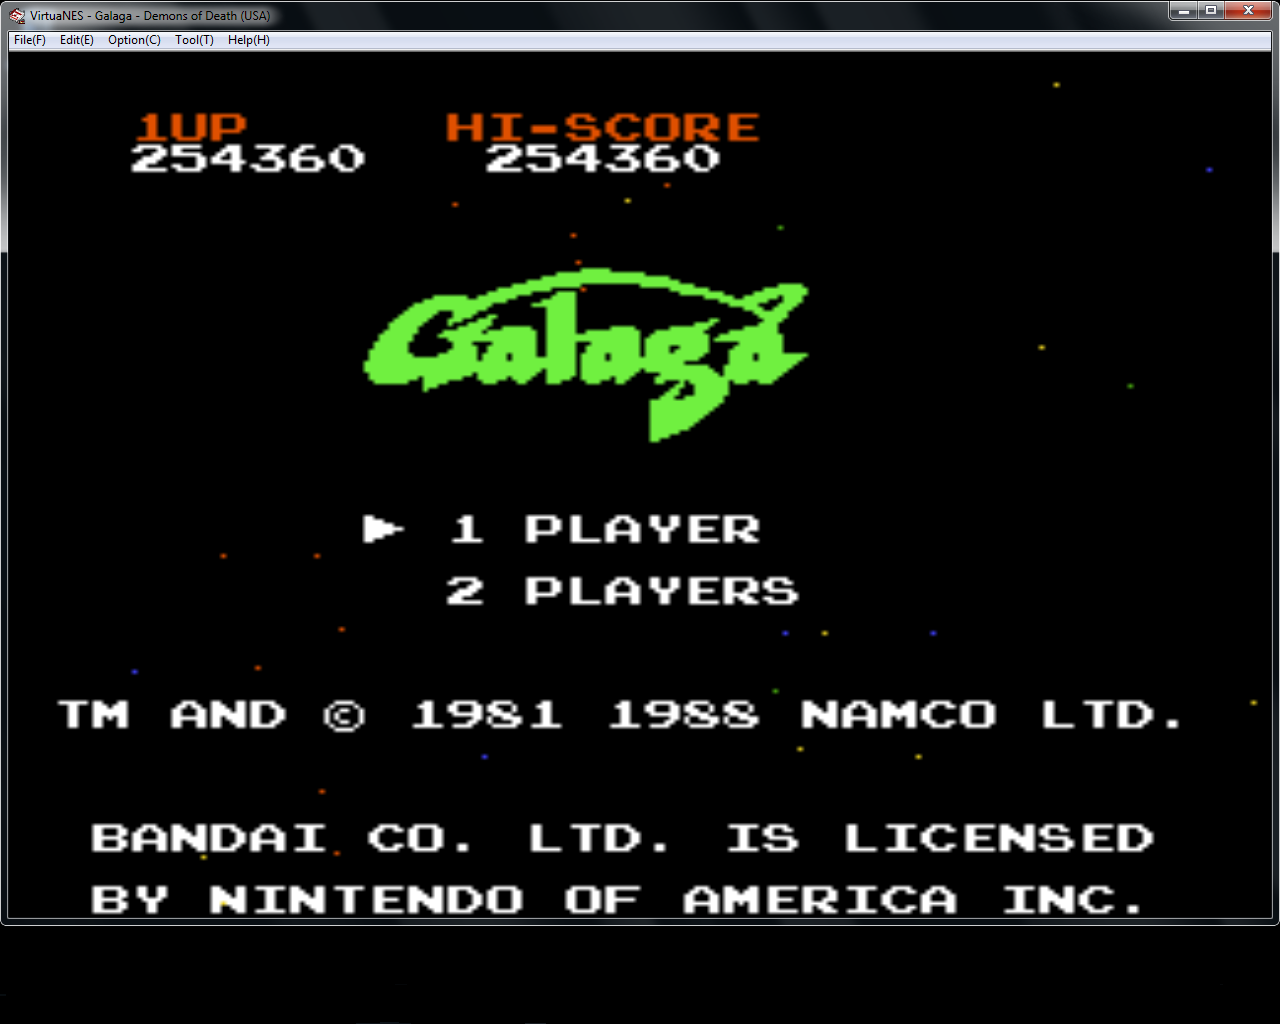 Galaga 254,360 points